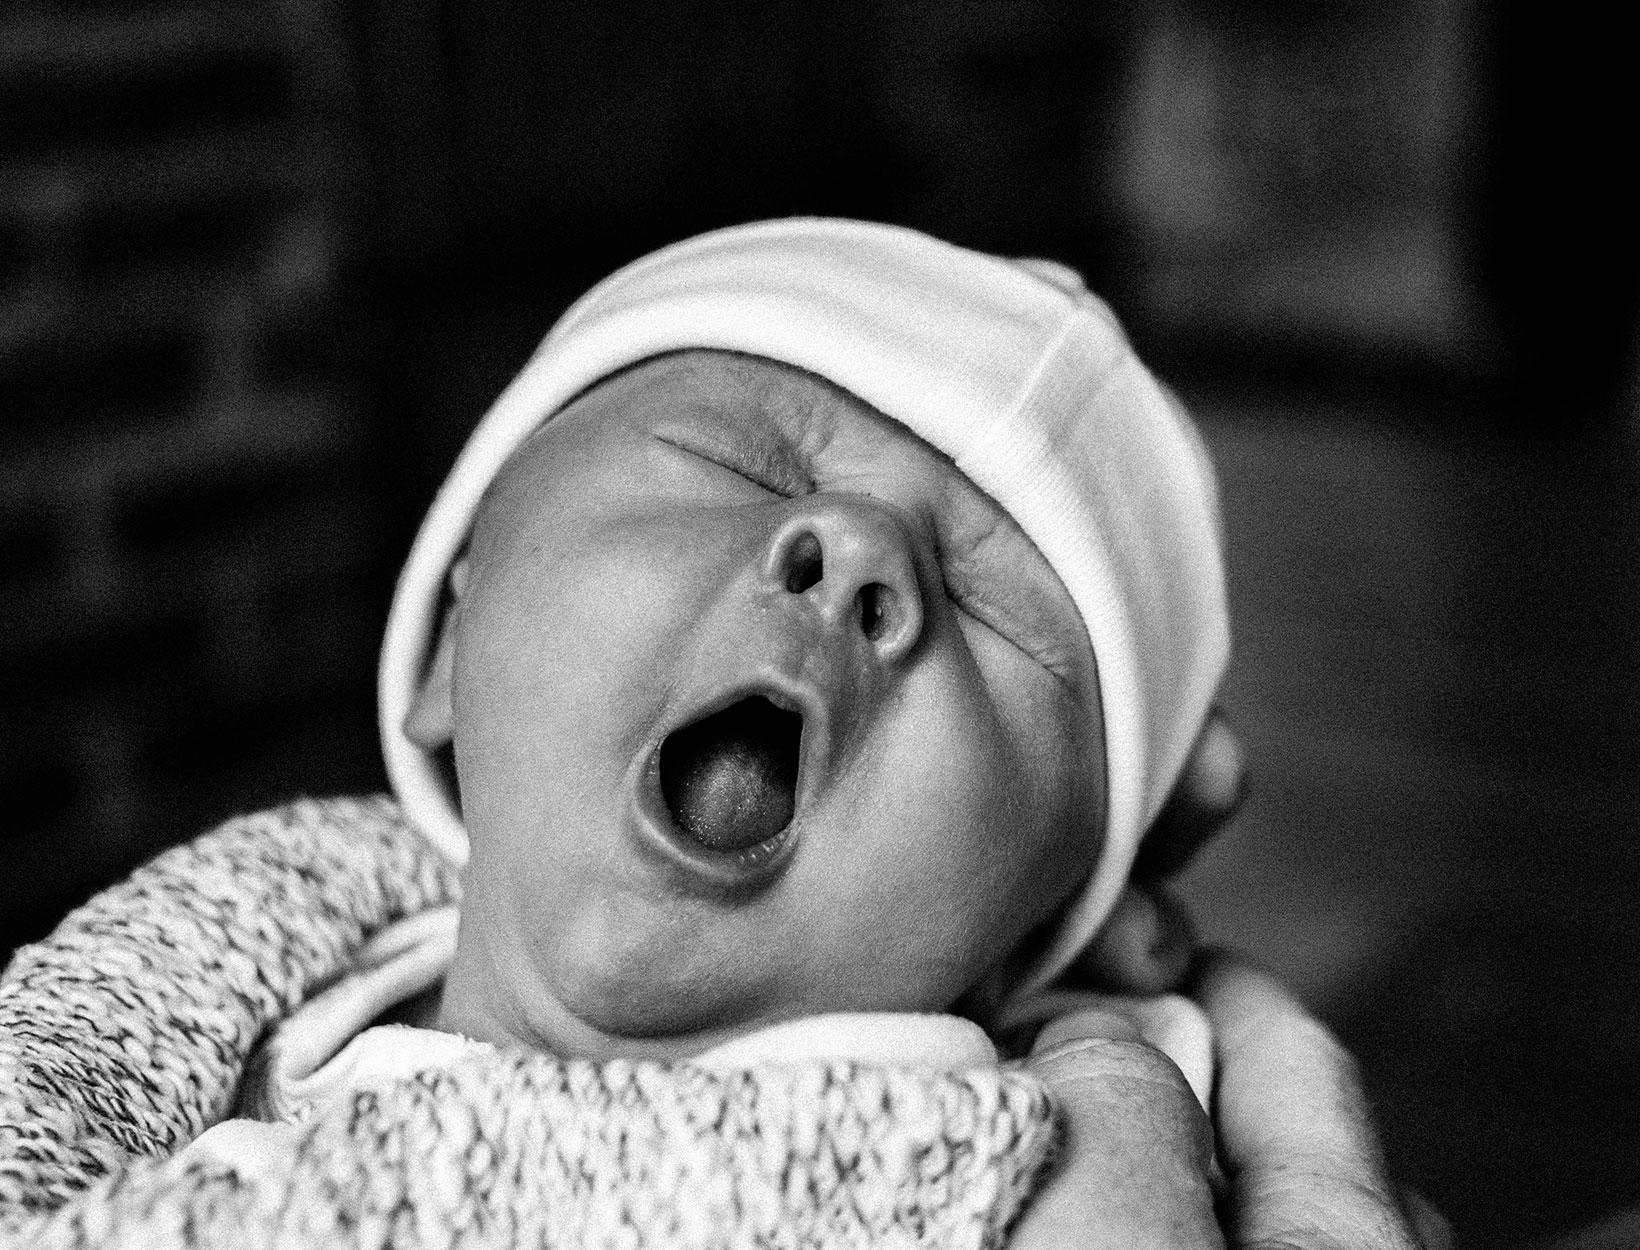 A Pediatrician on Breaking Bad Sleep Hygiene